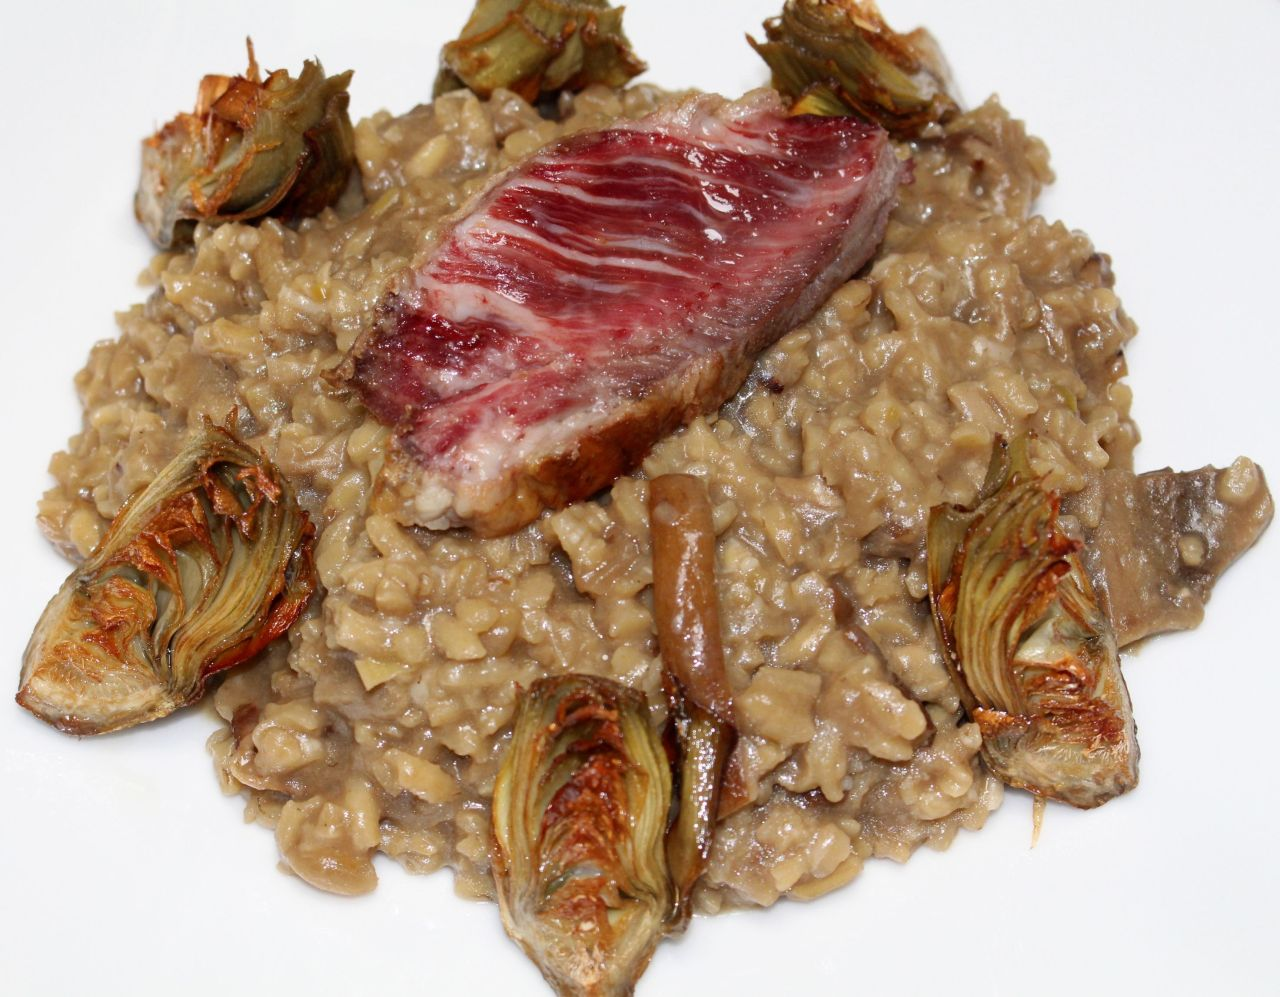 Risotto con Boletus, Presa Ibérica yAlcachofas